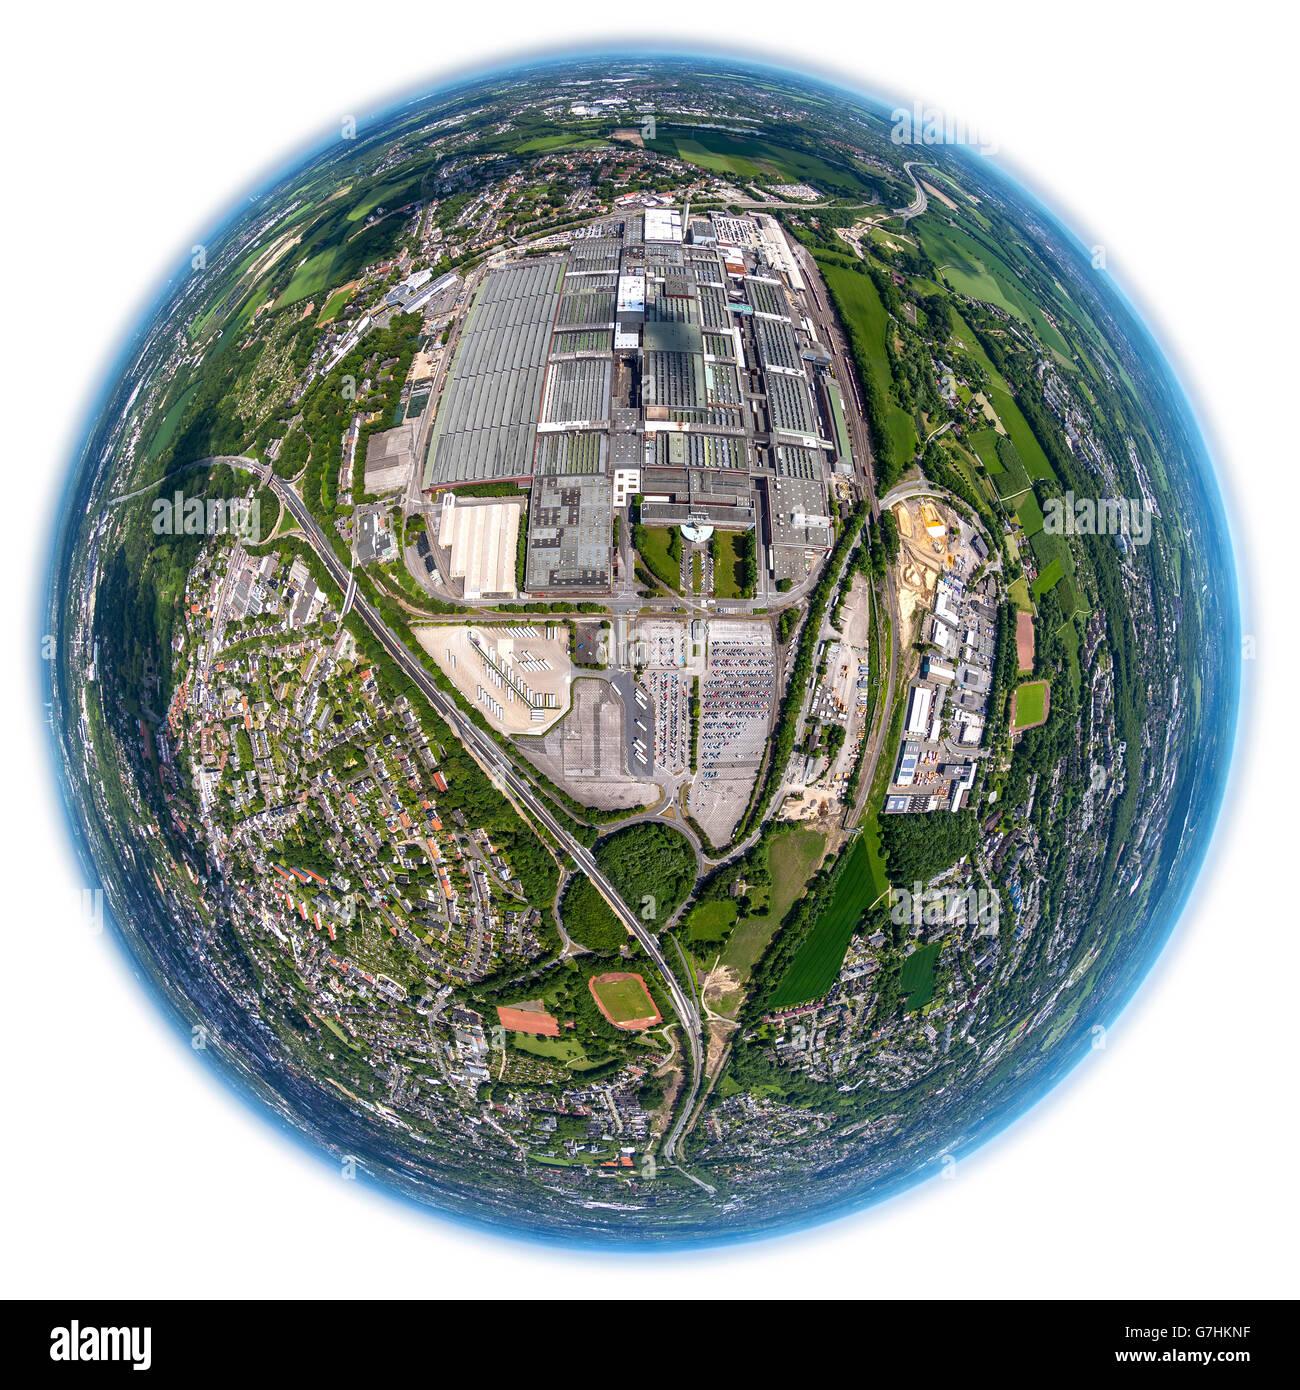 Aerial view, fisheye optics, fisheye lens, OPEL I plant, automobile farmer, decommissioning, work object, plant - Stock Image